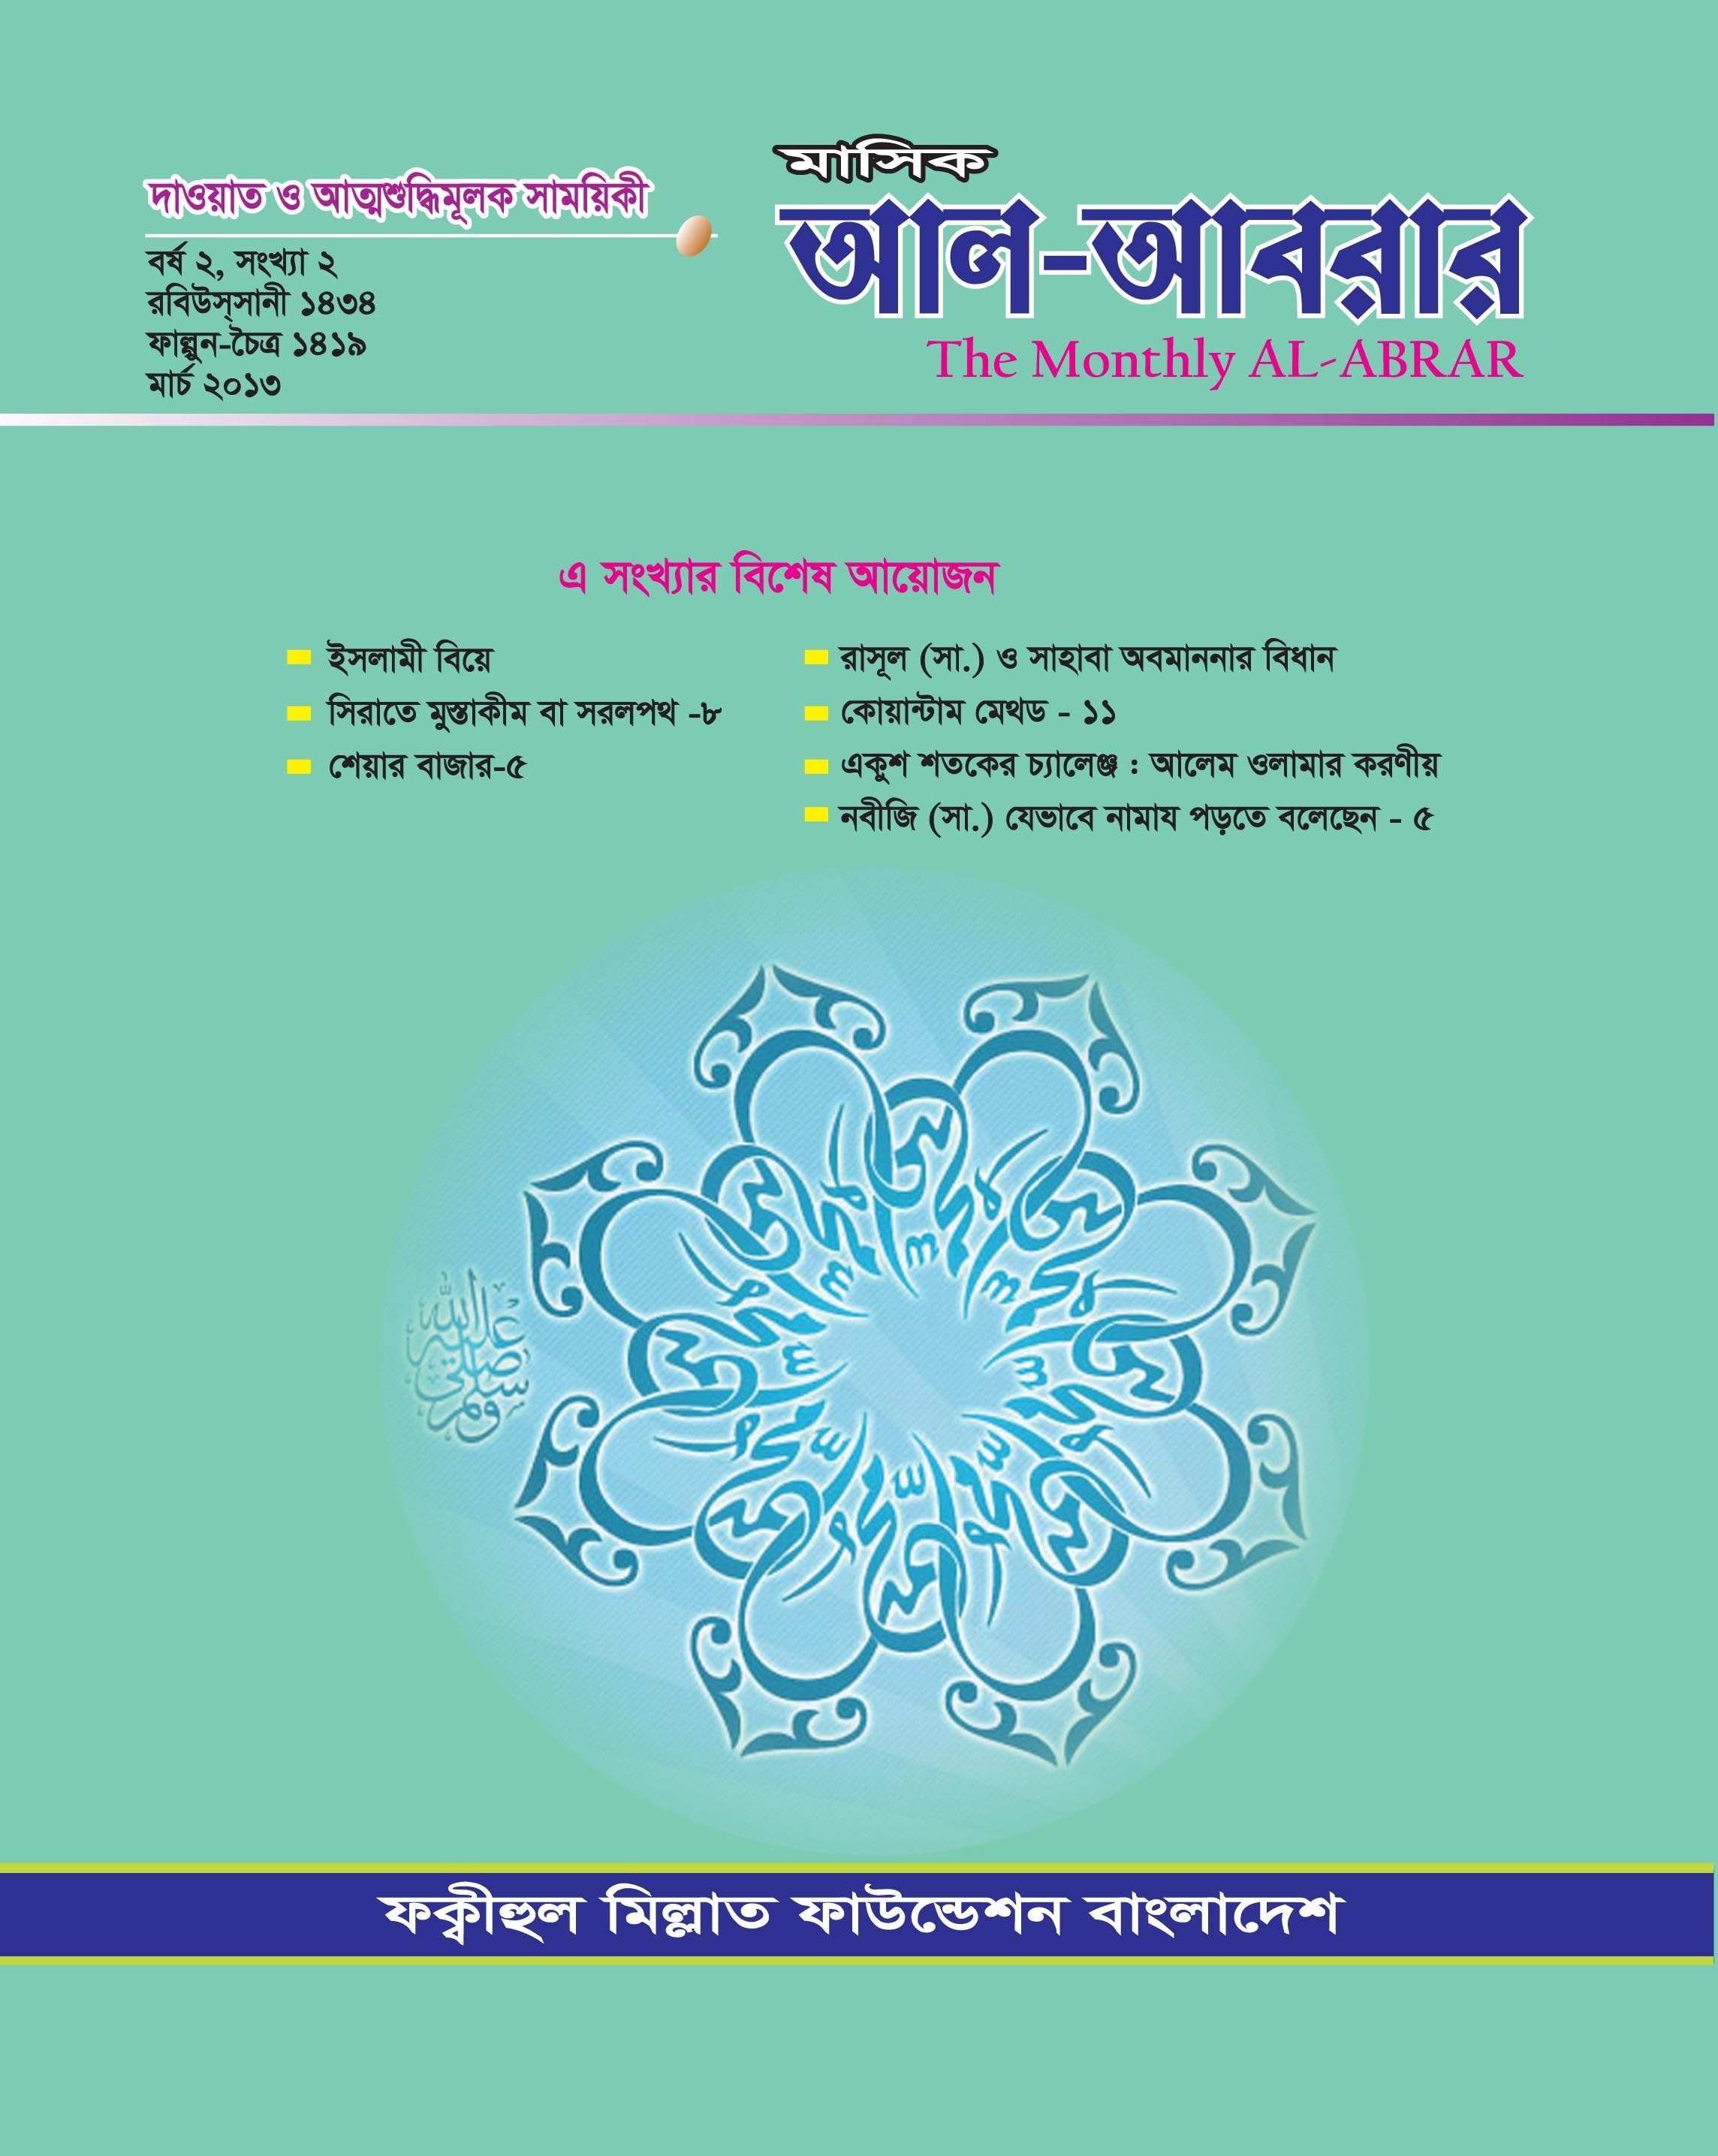 Cover Finel 3-2013-Fainal